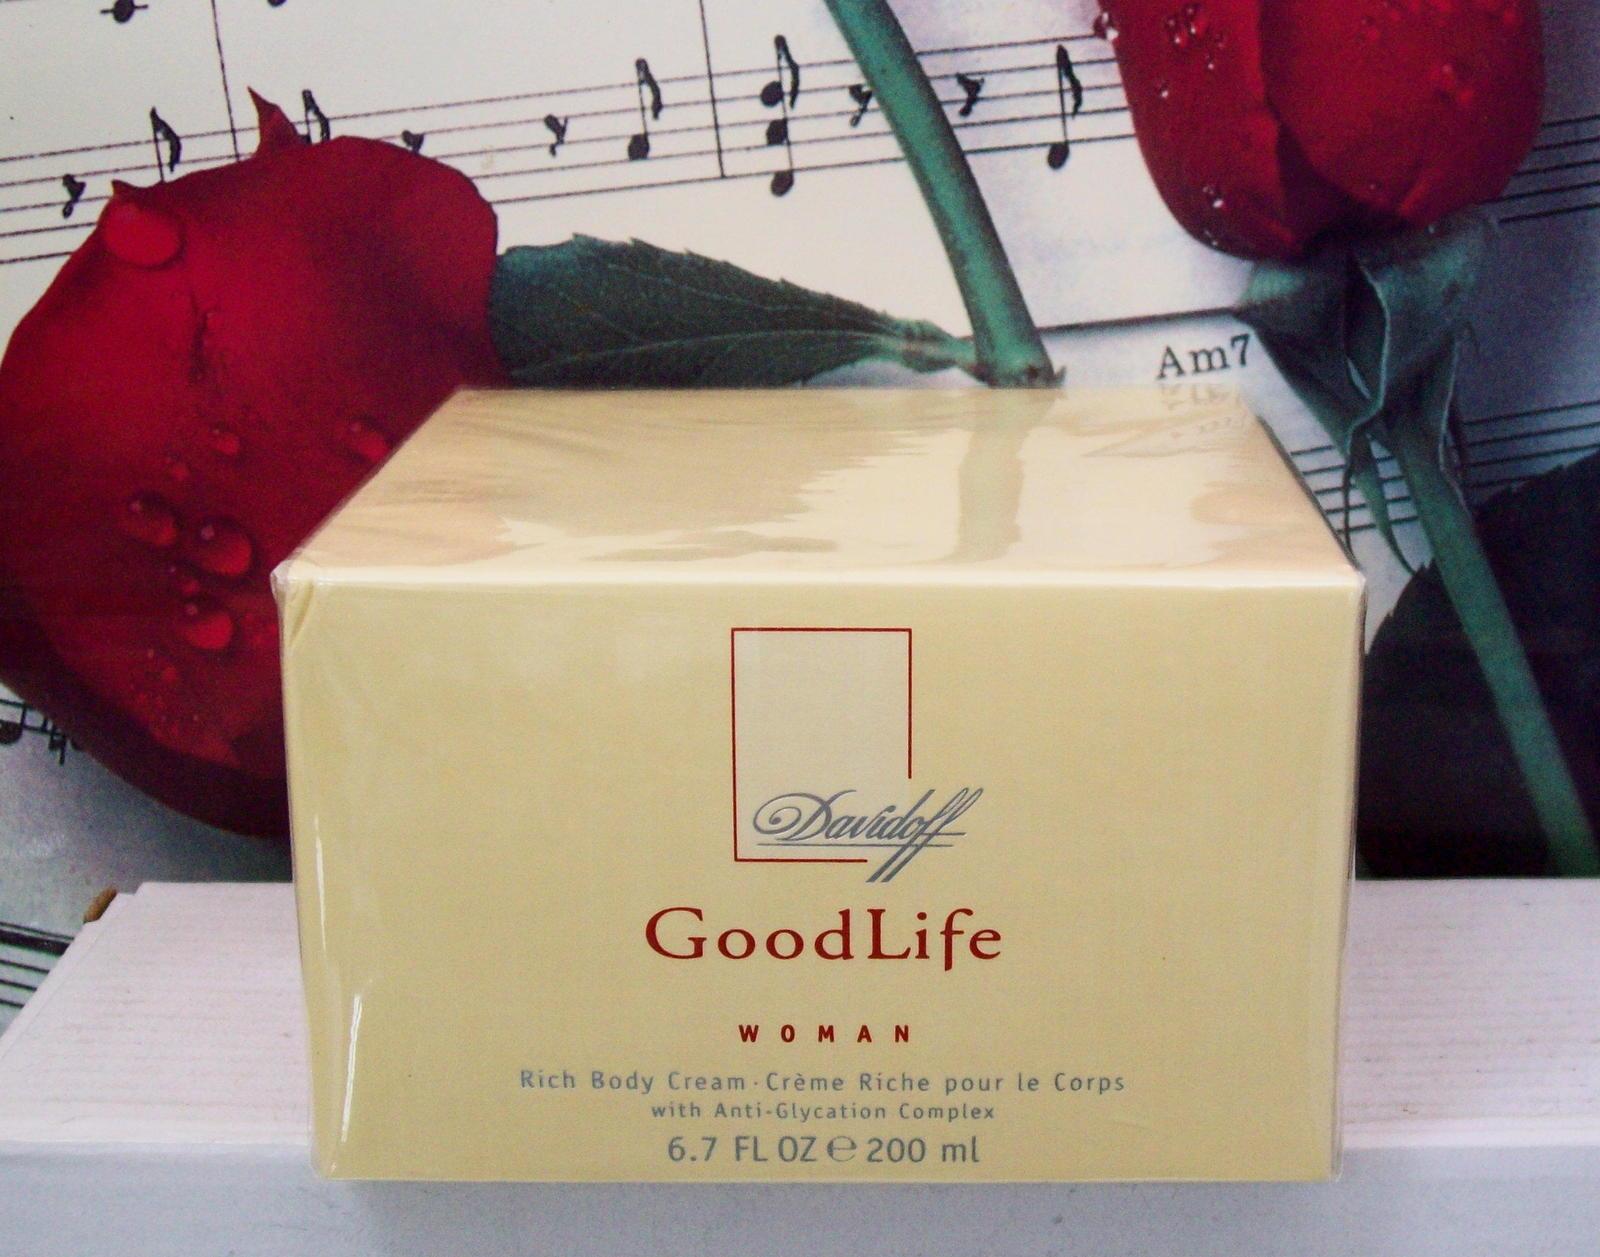 Davidoff Good Life Woman Body Cream 6.7 FL. OZ. NWB - $99.99